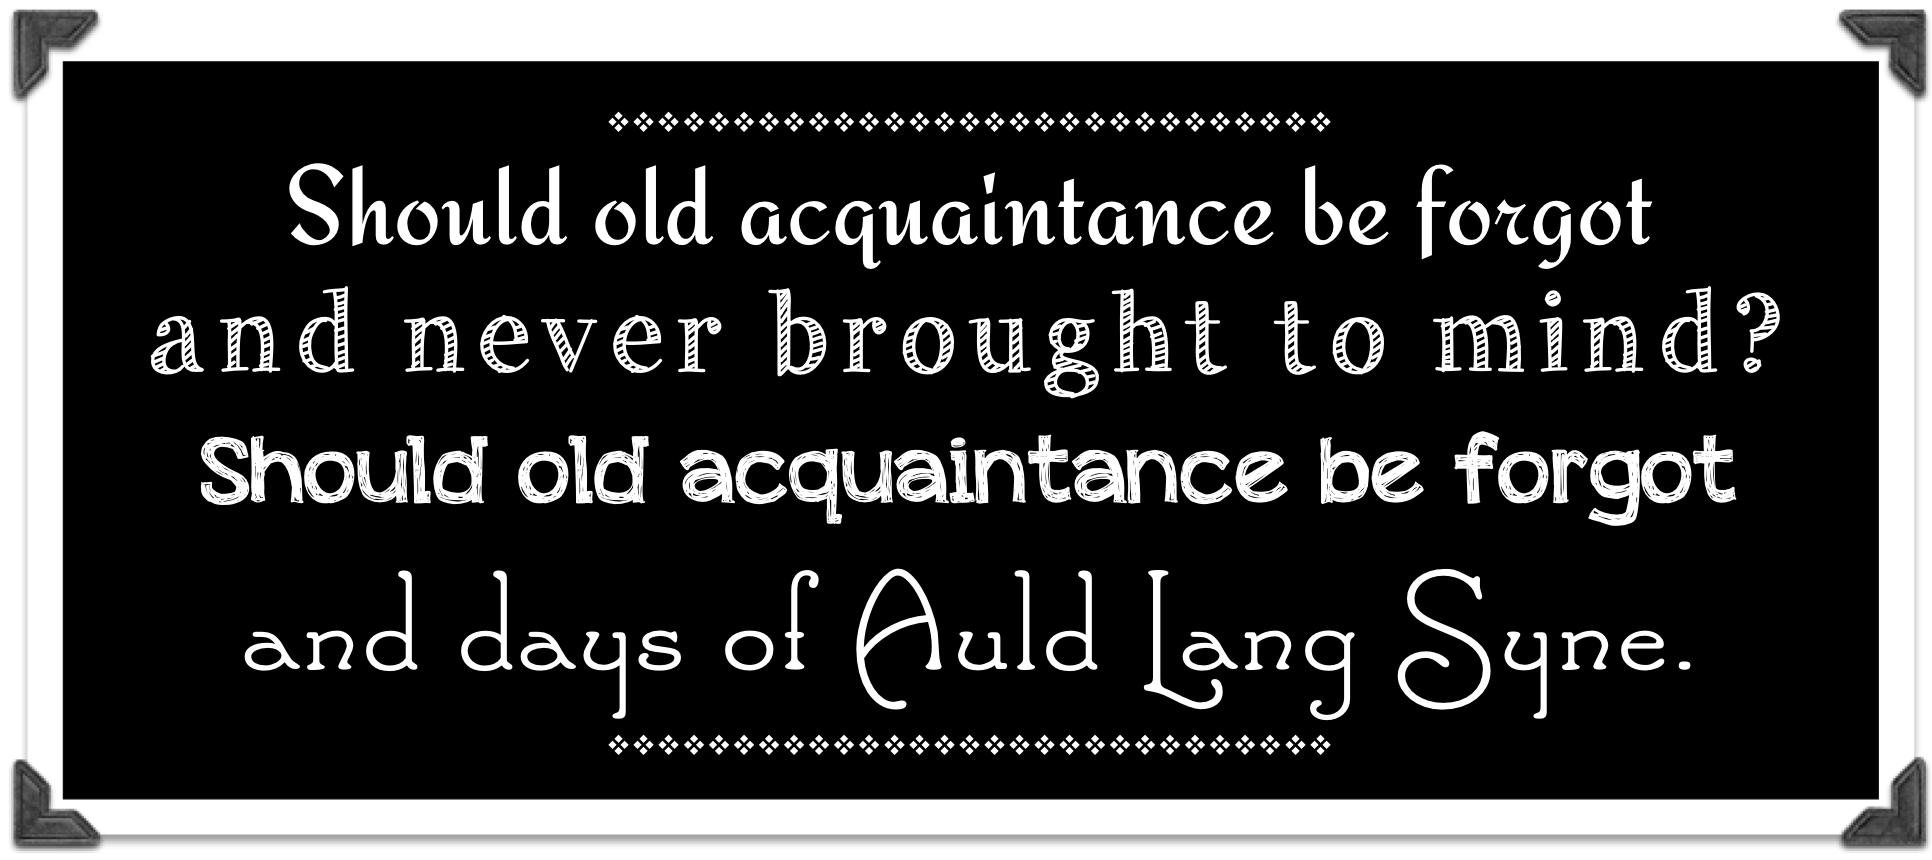 For Auld Lang Syne | Julianna W. Miner